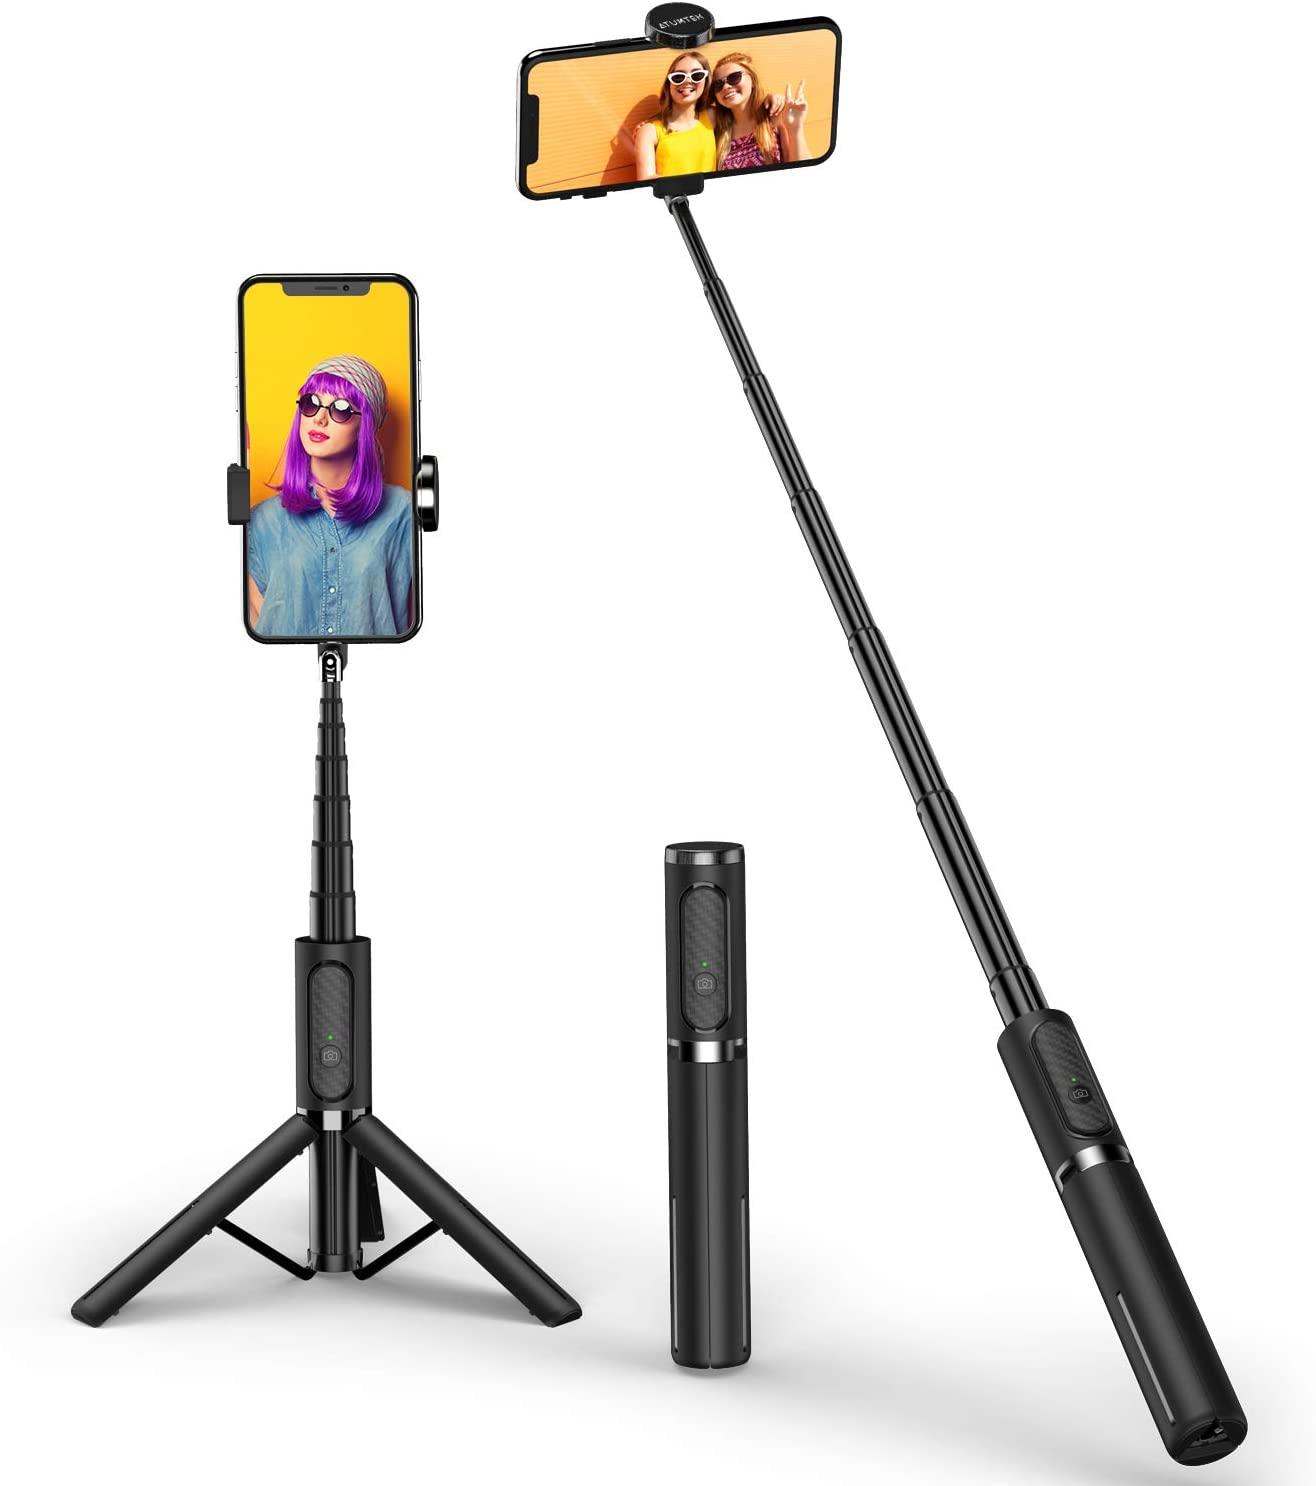 Top 5 Google Pixel 2 XL Selfie Stick 2020 Review